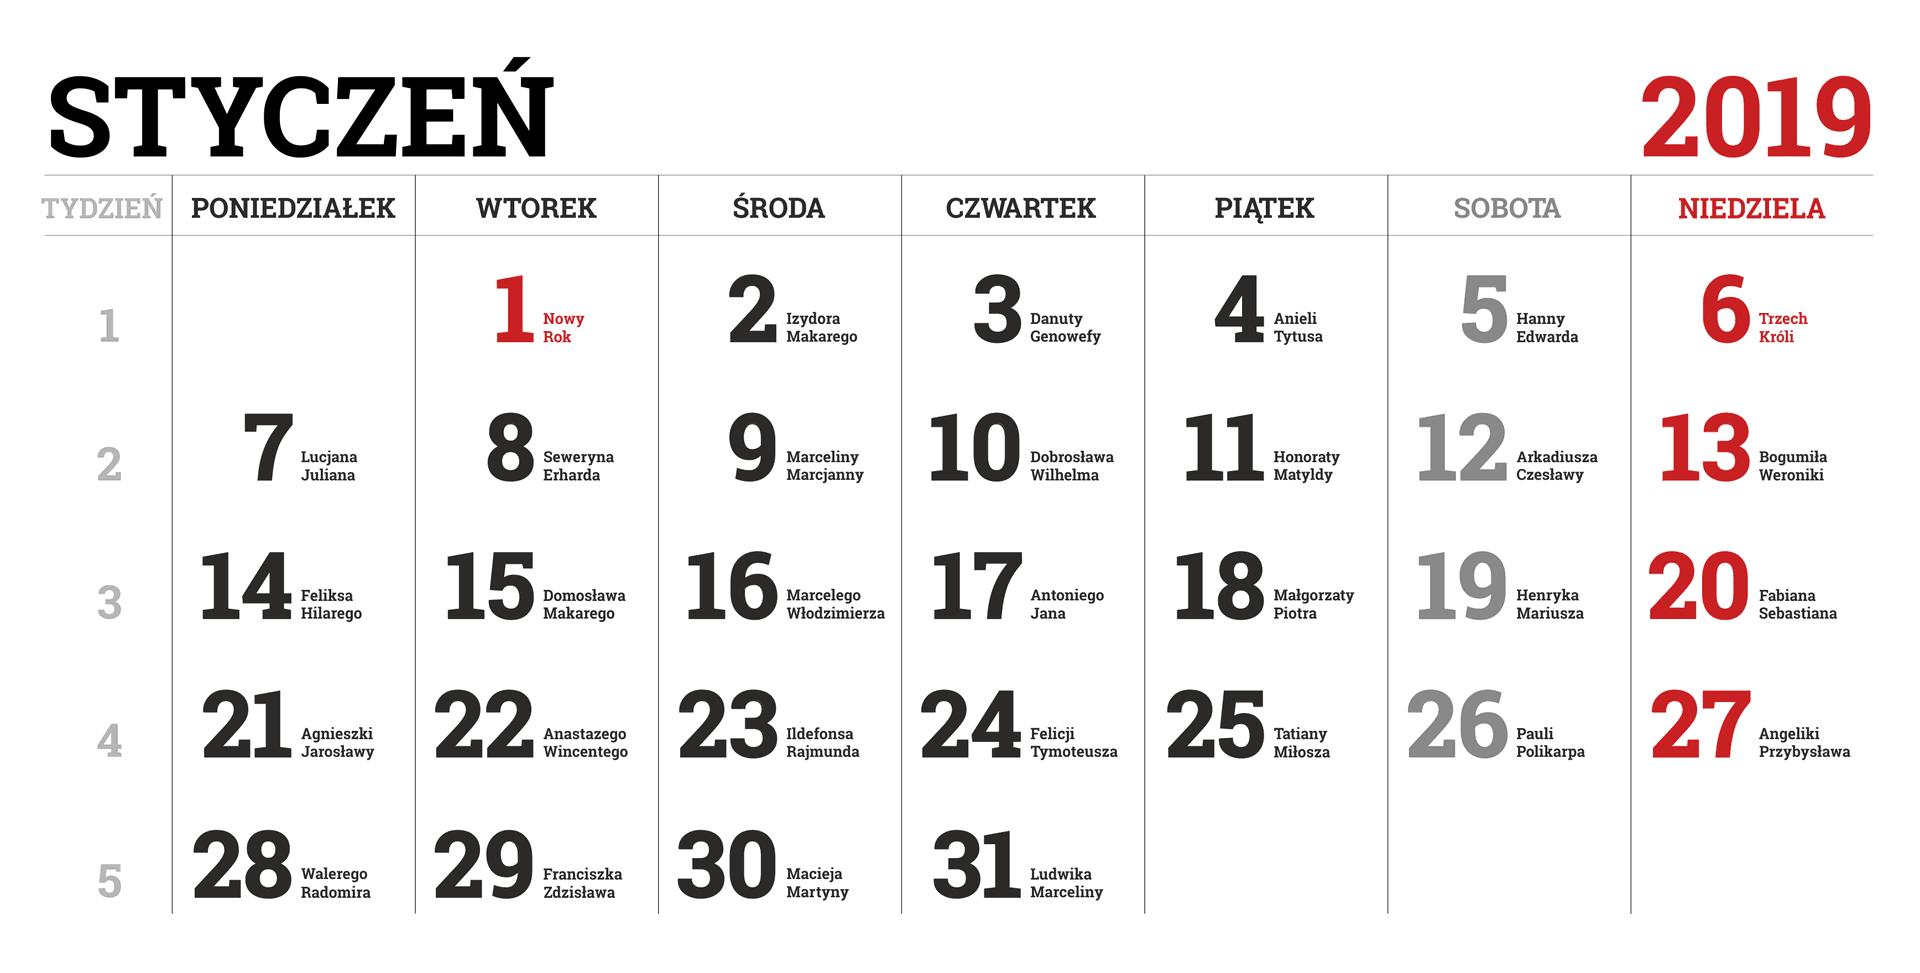 Kalendarium miesiąca stycznia 2019 roku